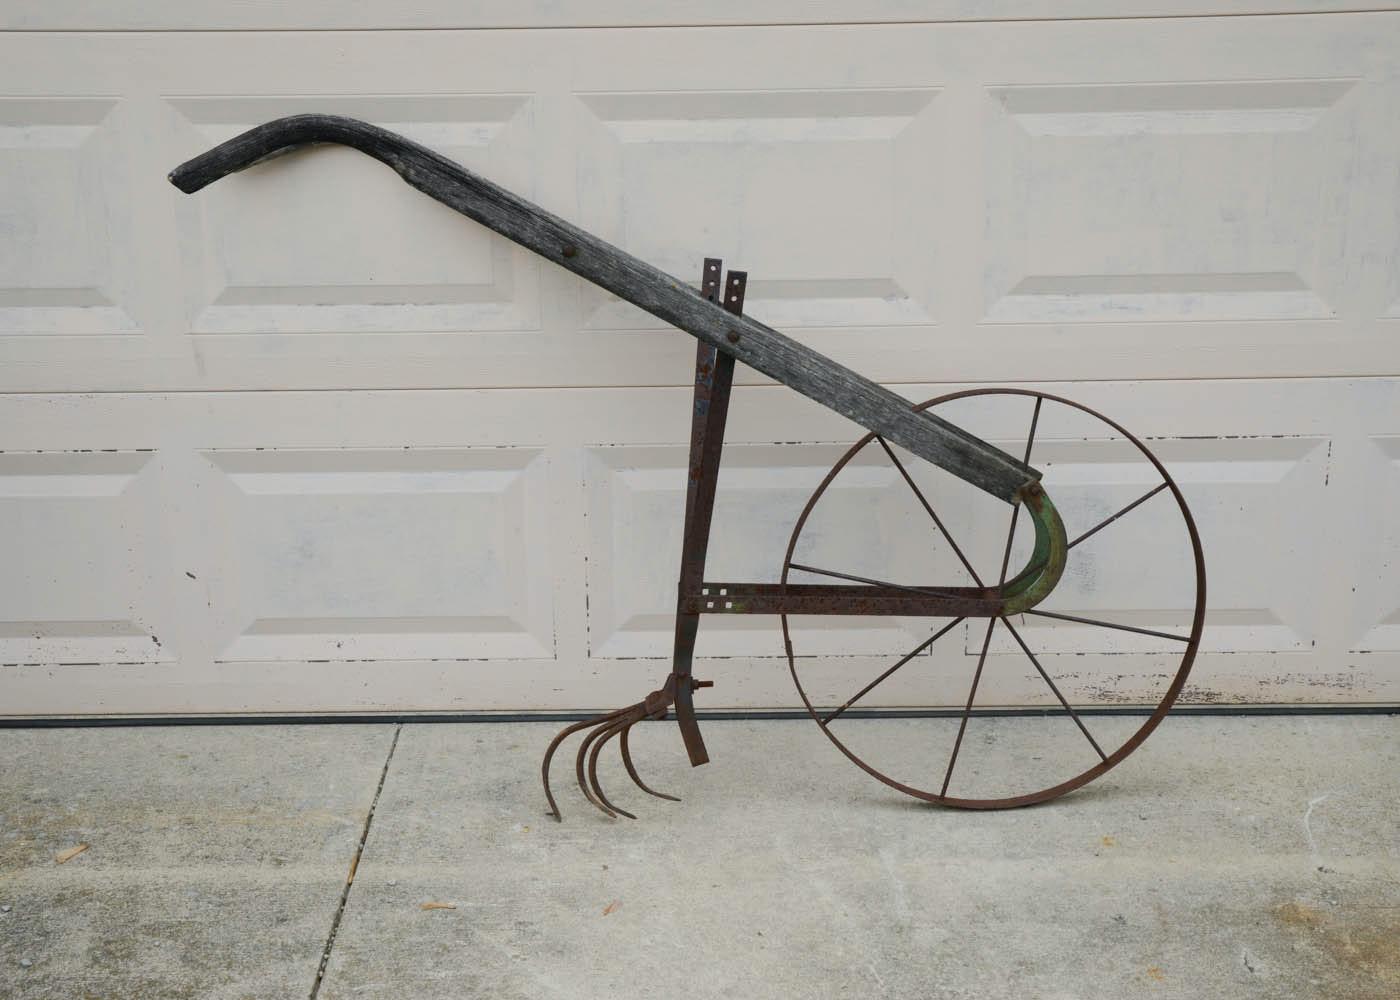 Vintage Wooden Push Plow